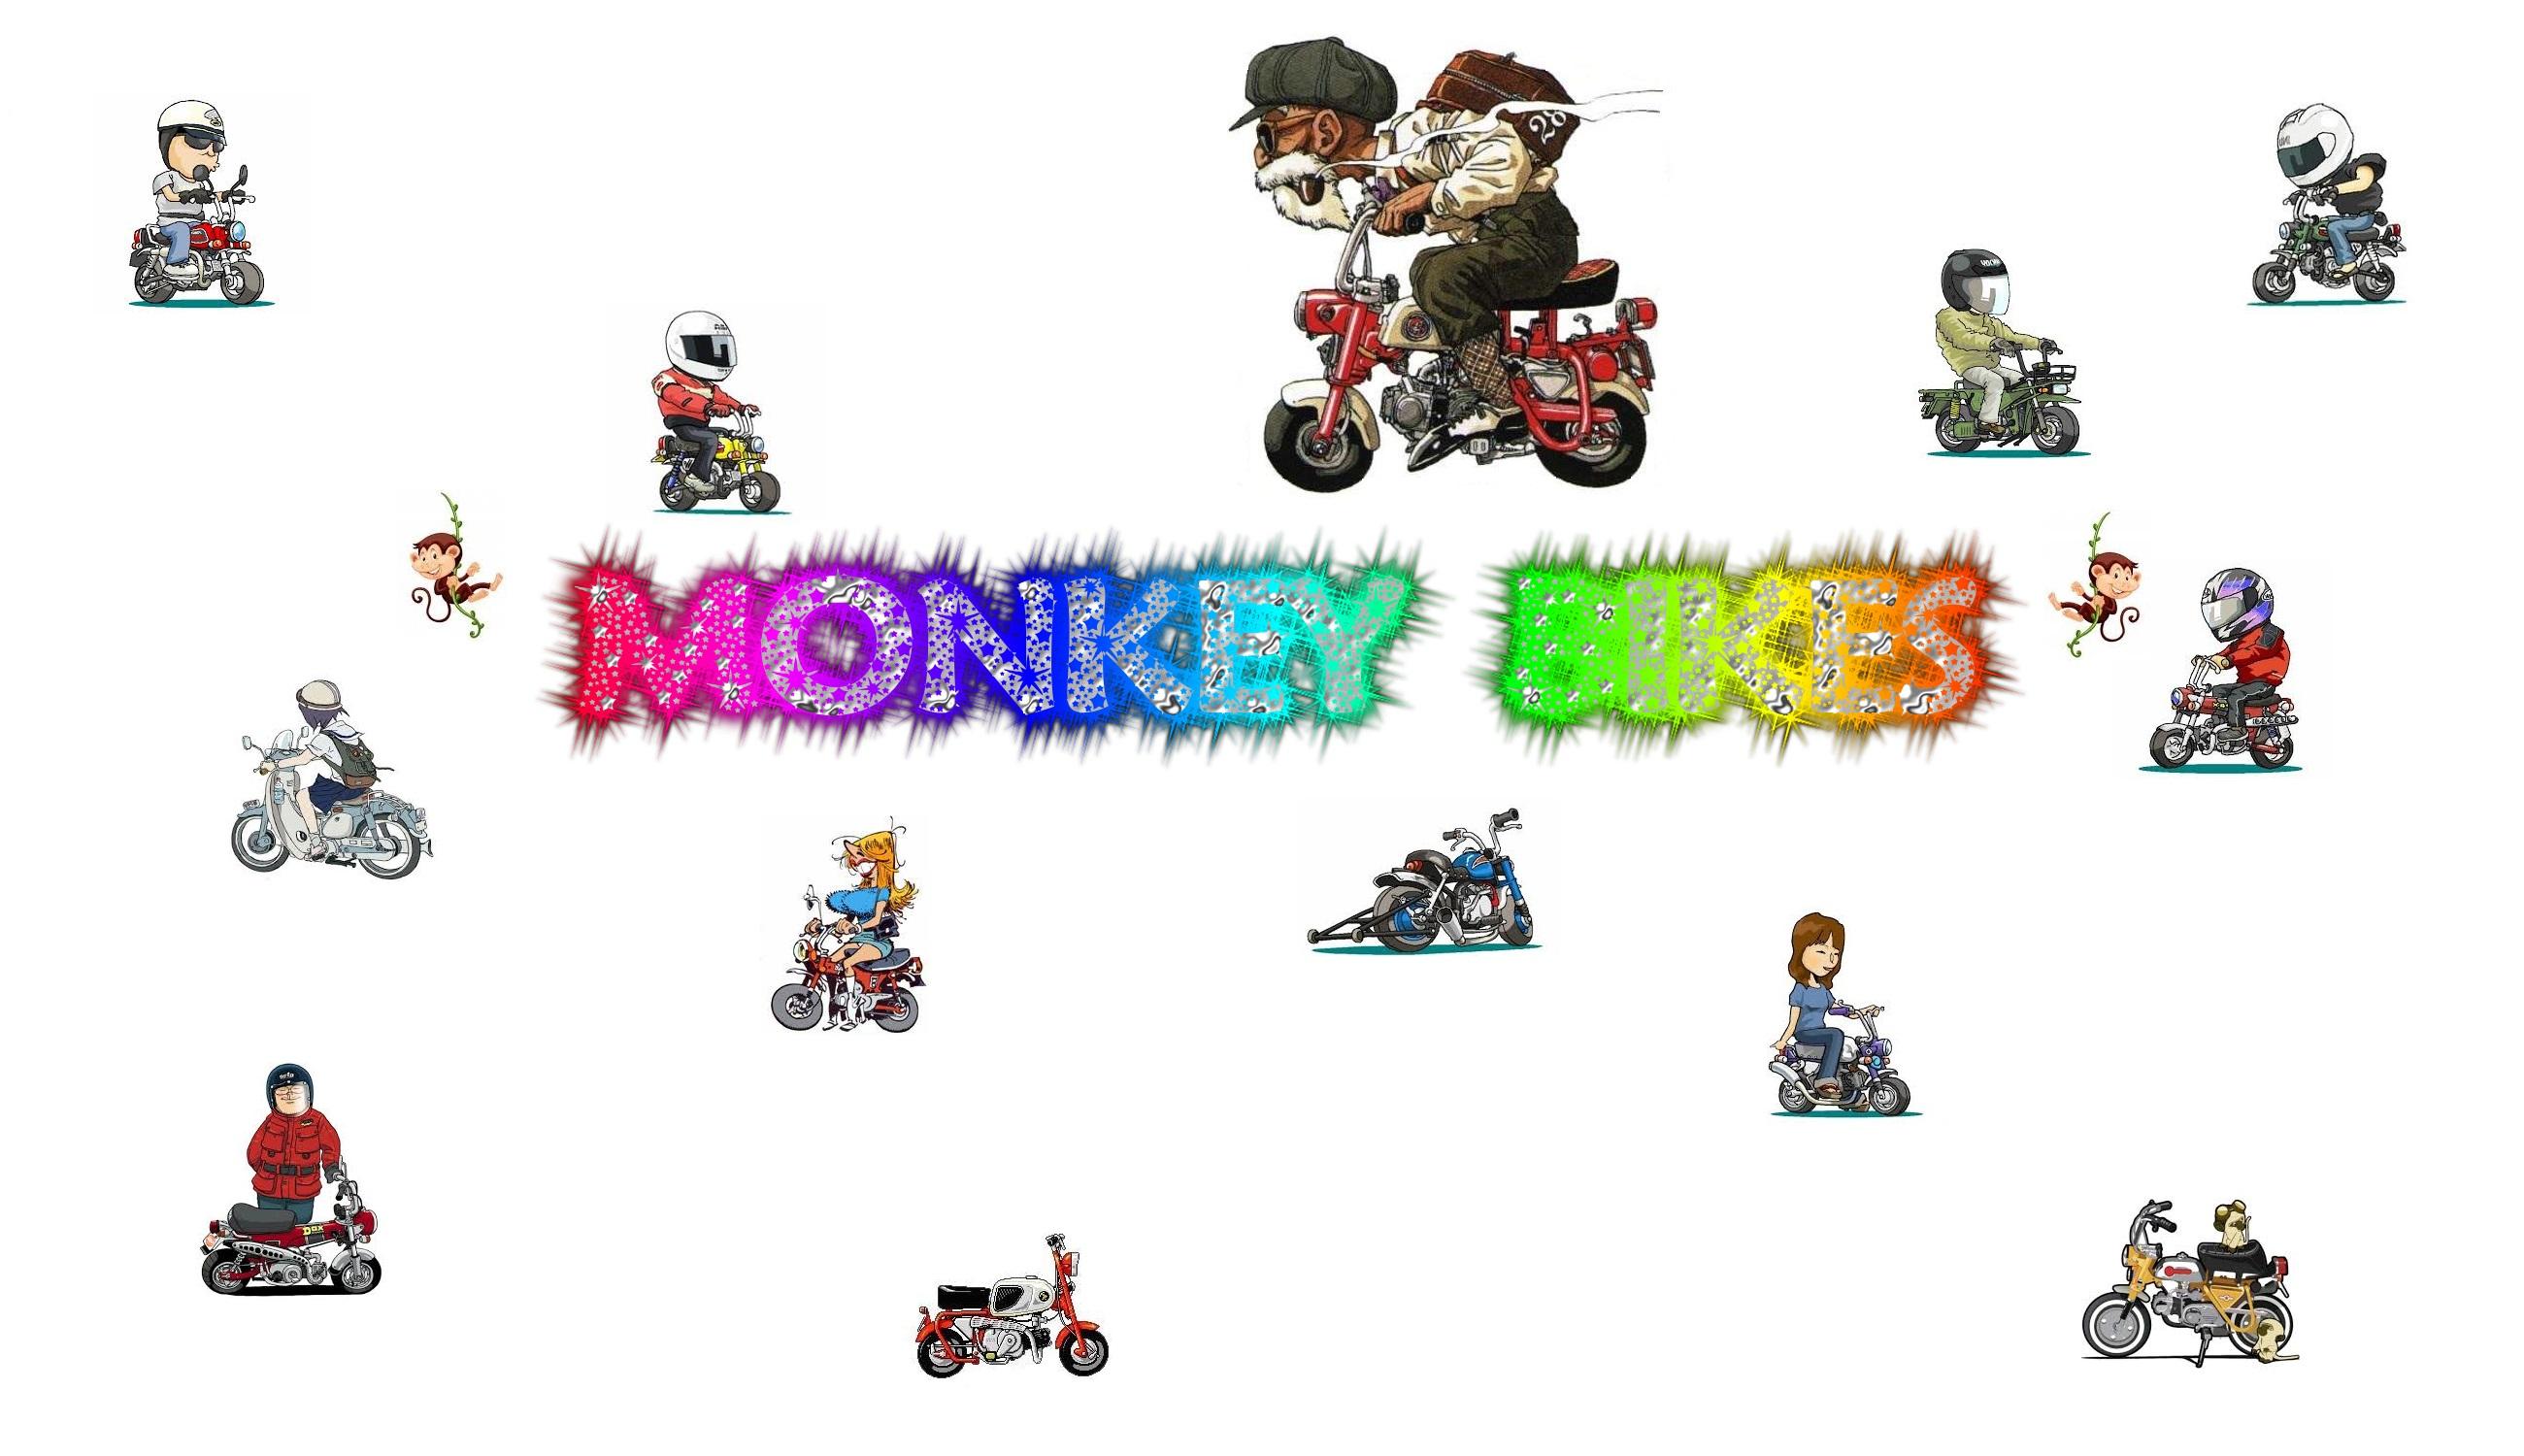 Formal presentation Monkey bikes-ci-8xcqwwaalqgo.jpg